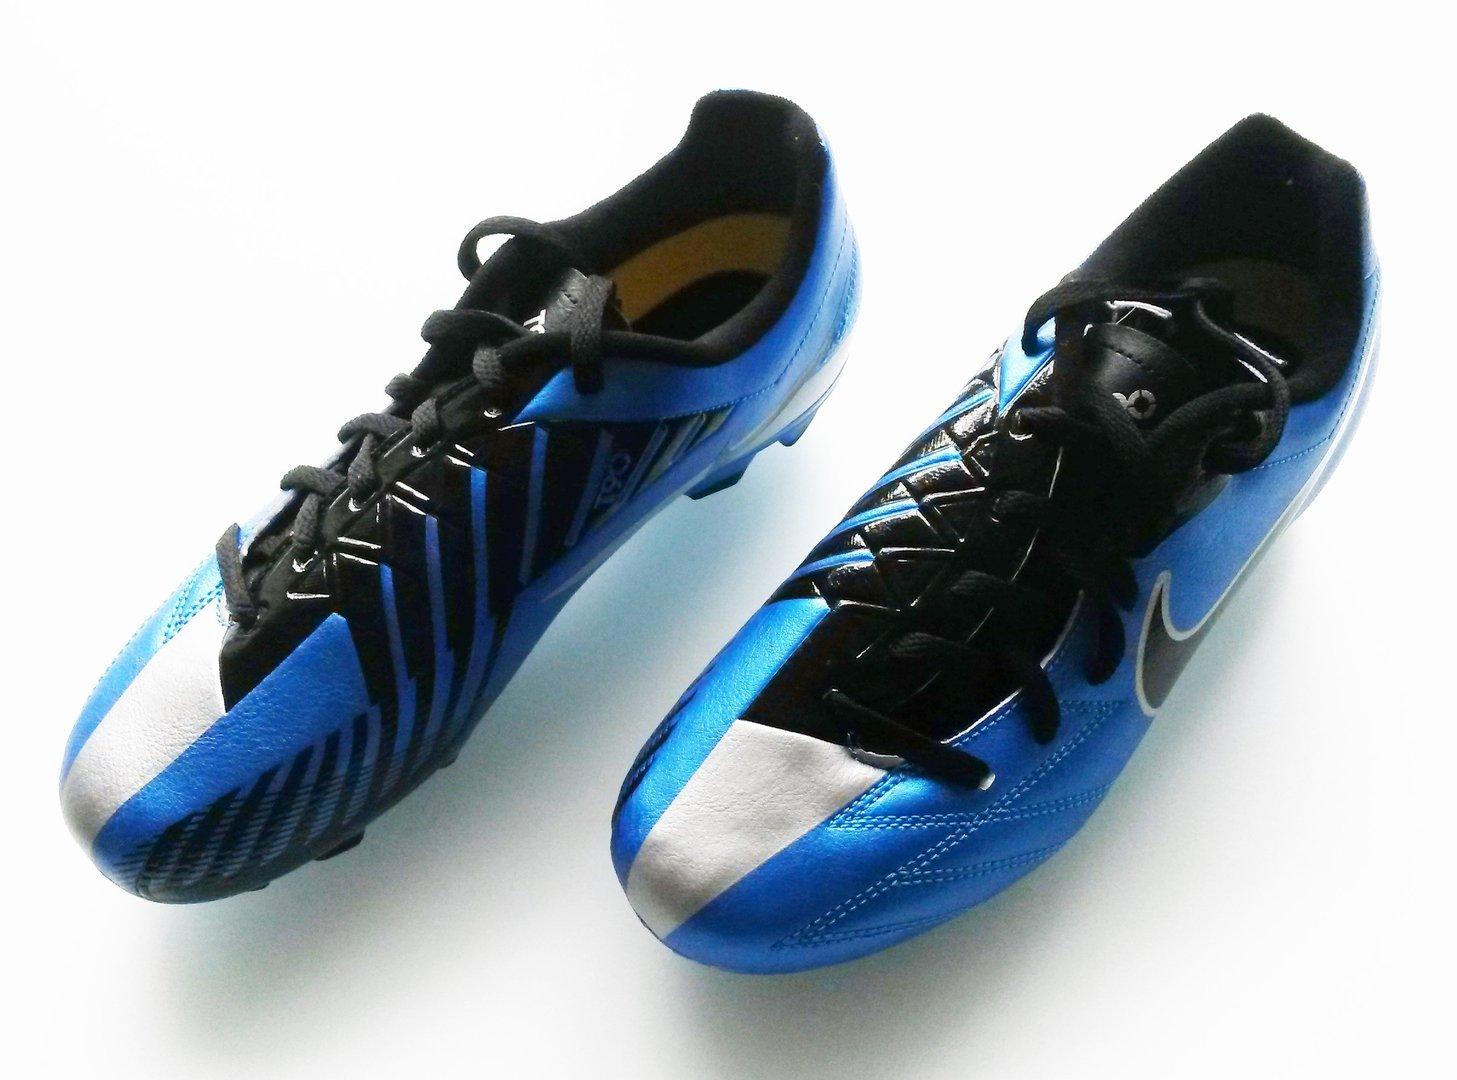 online store 8fd3a c0595 (398) Nike T90 shoot IV FG football boots size 4 BNIB ...